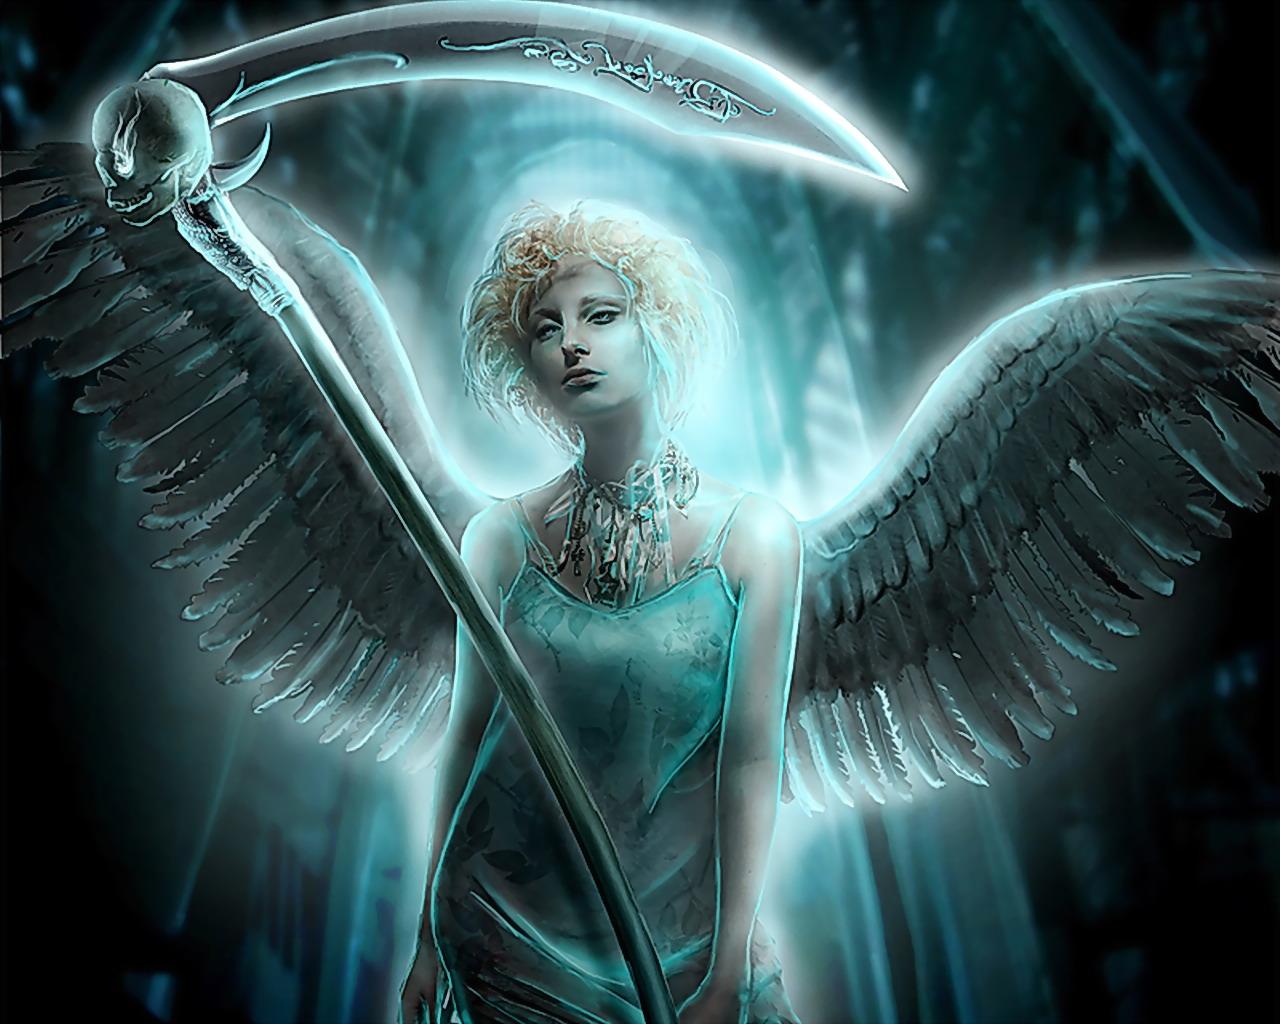 [45+] Angel of Death Wallpaper on WallpaperSafari